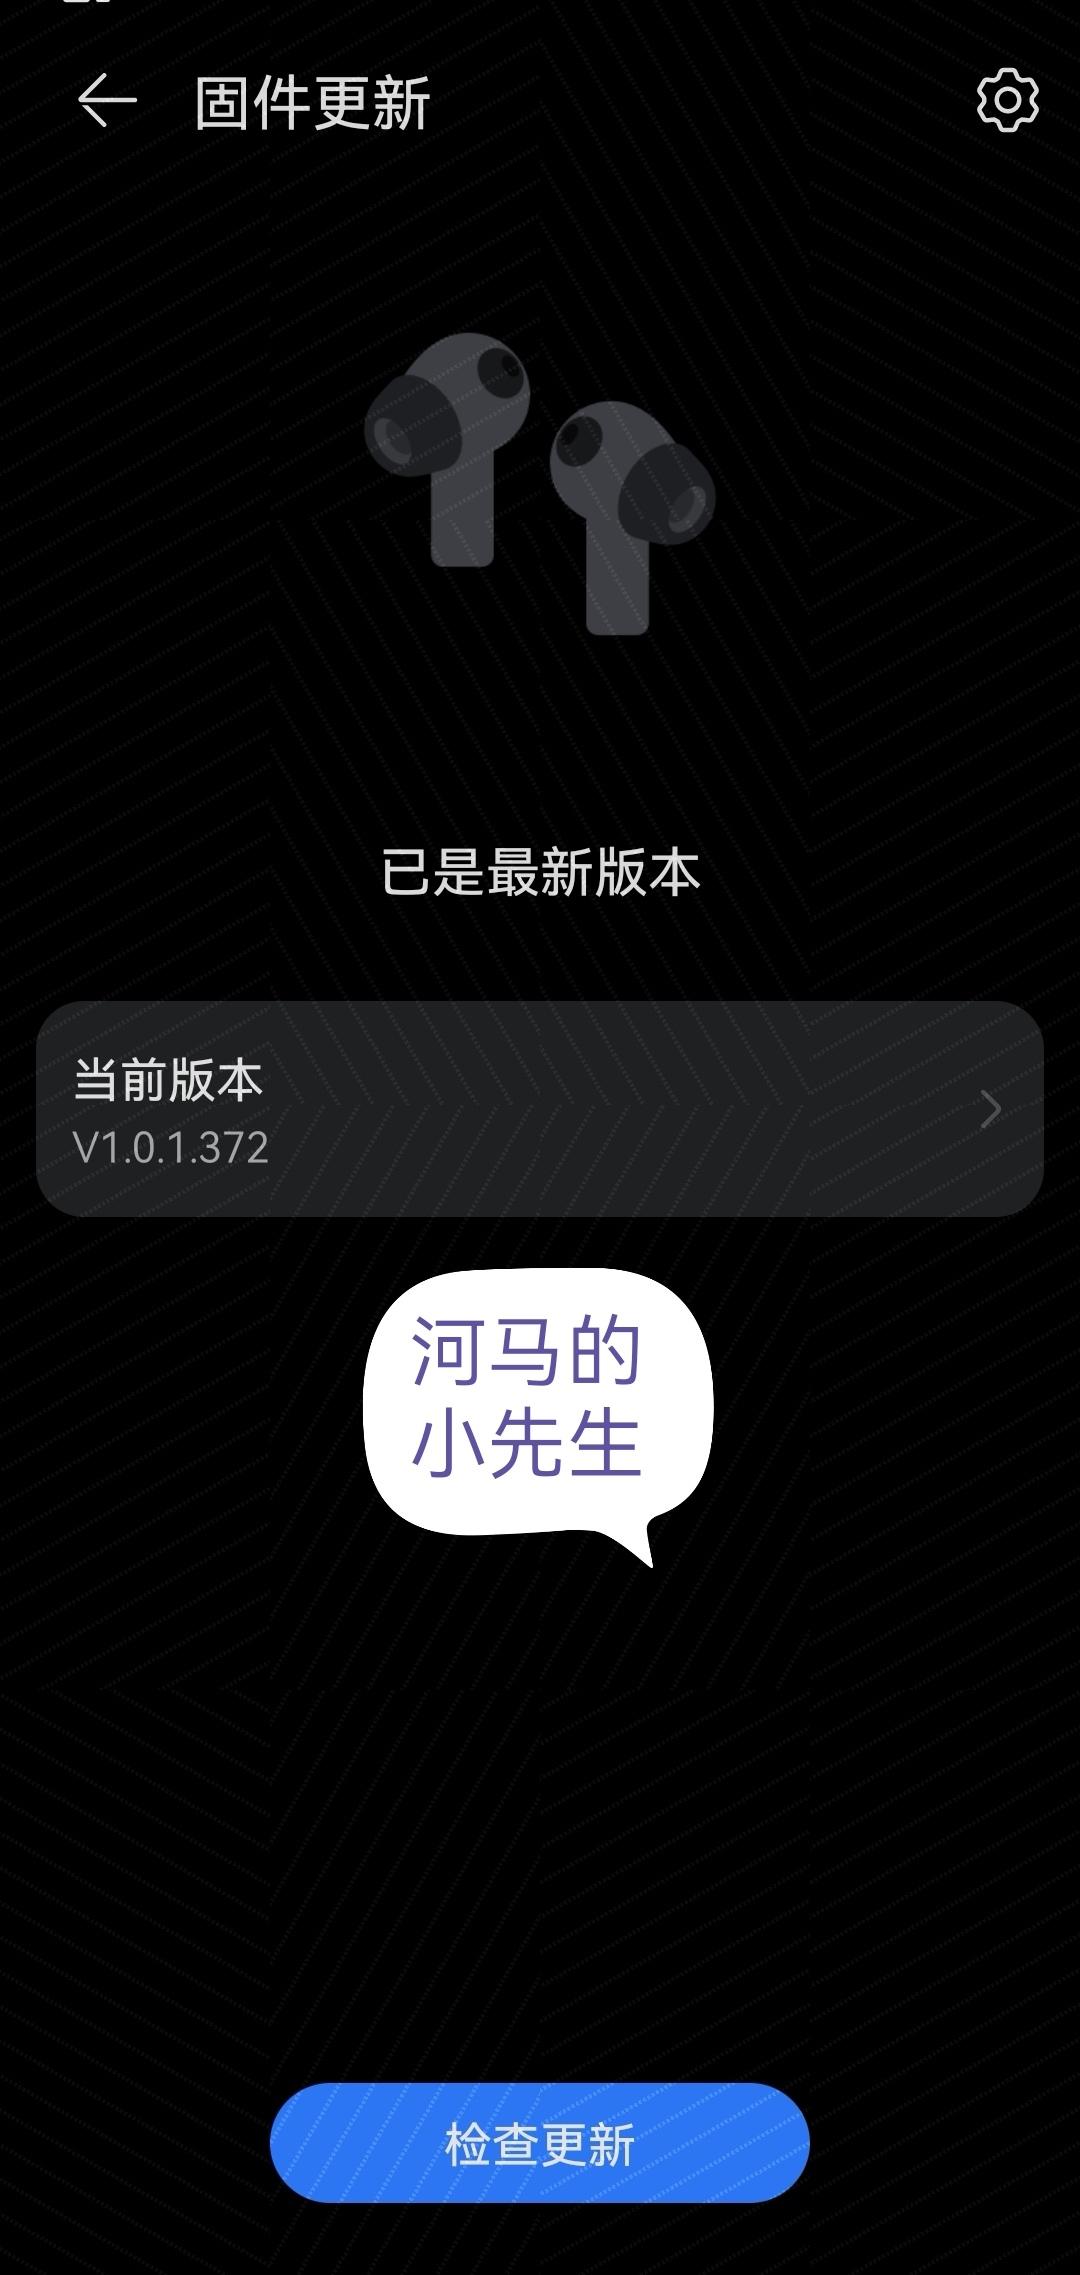 Screenshot_20210520_170913_edit_45158451050921.jpg